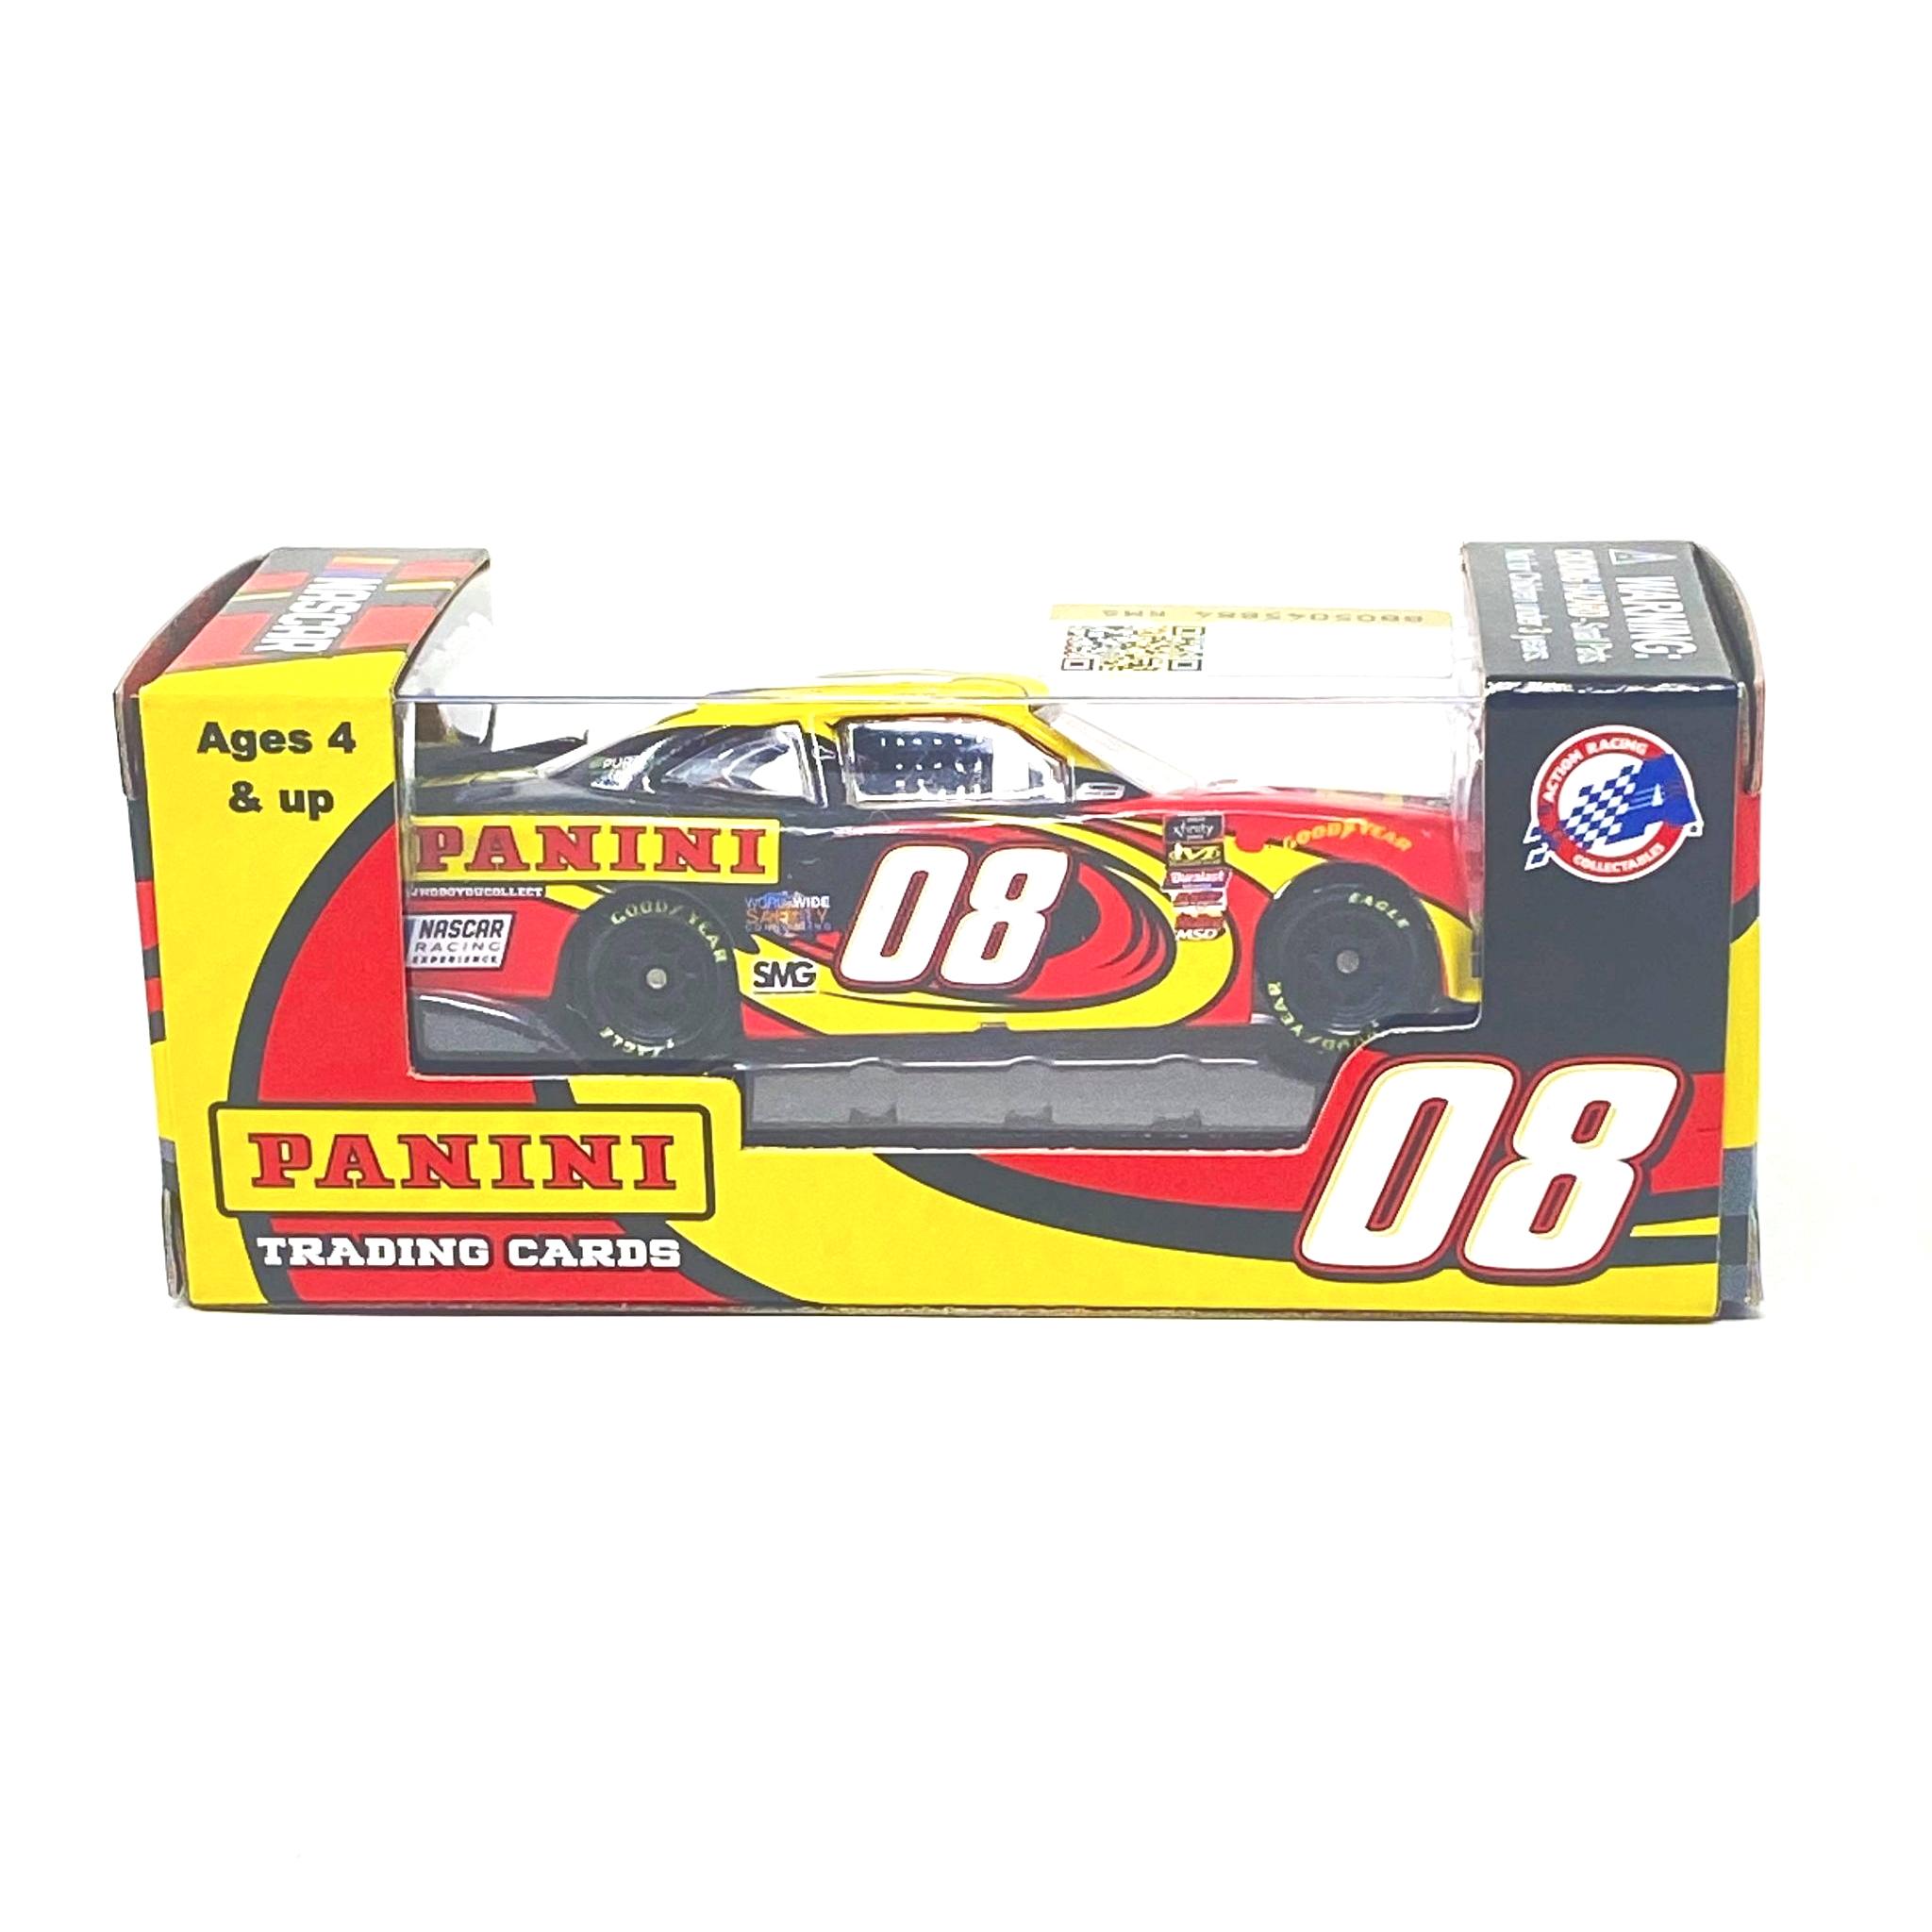 2018 #08 Gray Gaulding Panini Trading Cards Promo 1/64 Action NASCAR Diecast